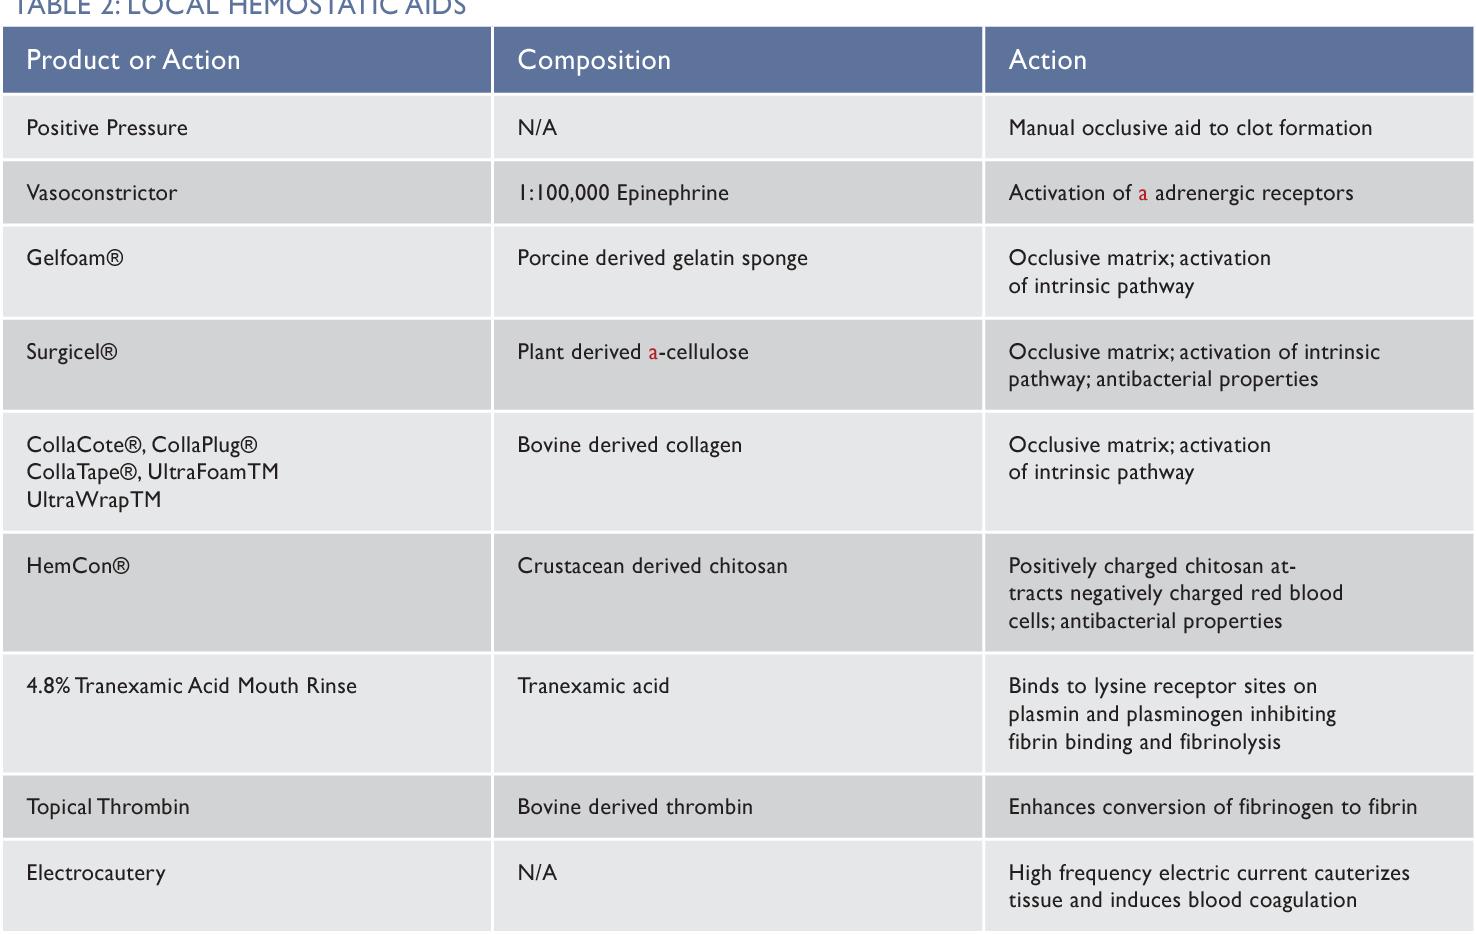 TABLE 2: LOCAL HEMOSTATIC AIDS